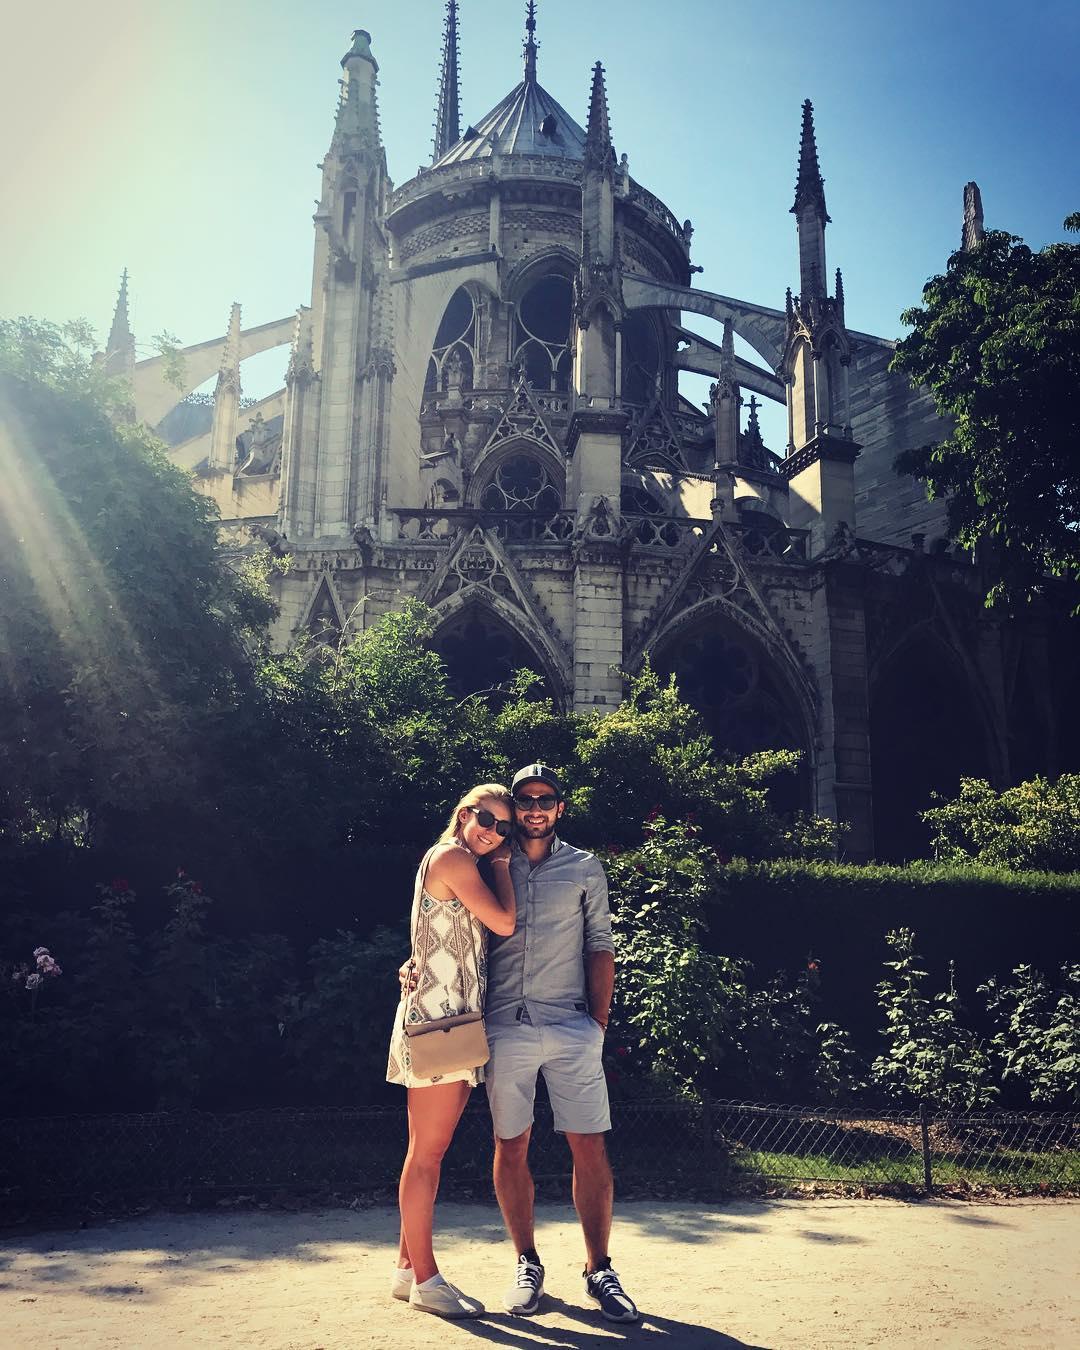 Mathieu Faivre y Mikaela Shiffrin, en París